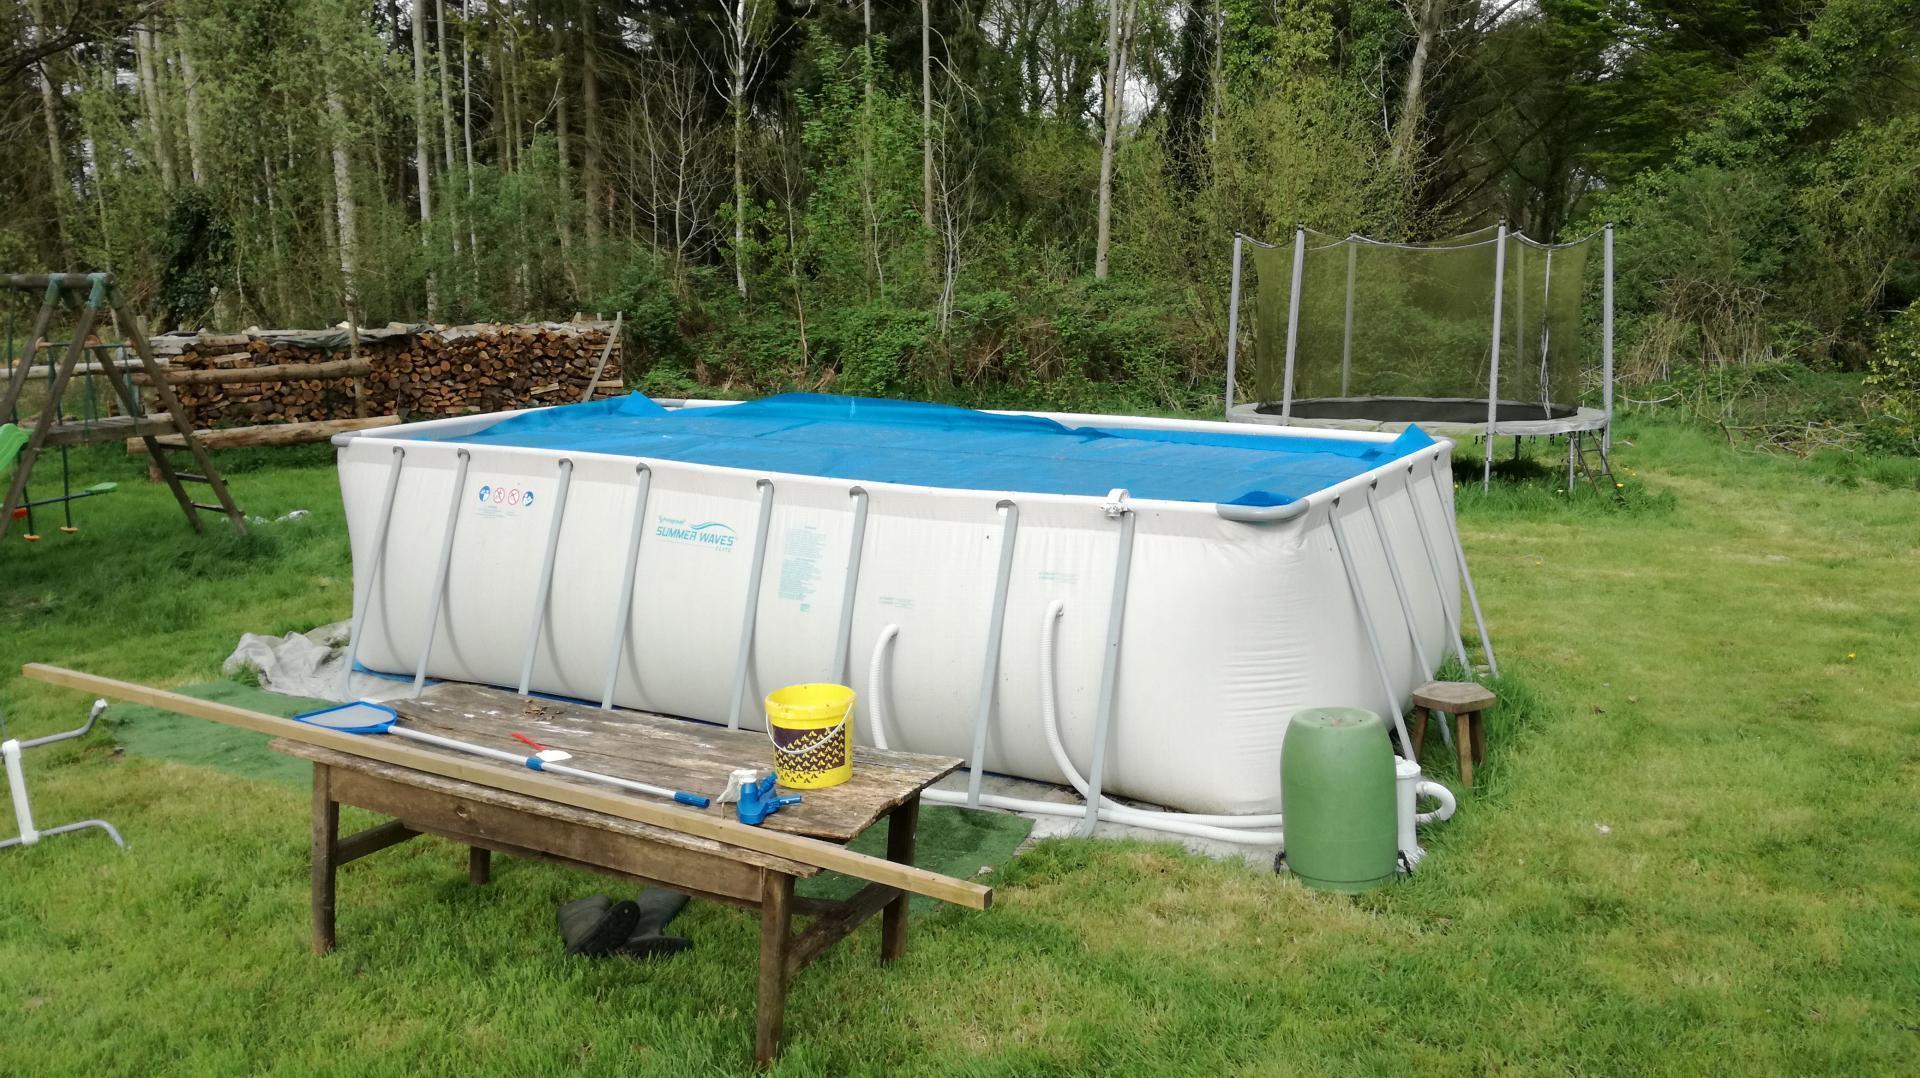 piscine tubulaire ludo 4 - 5.49 x 2.74 x 1.32 m